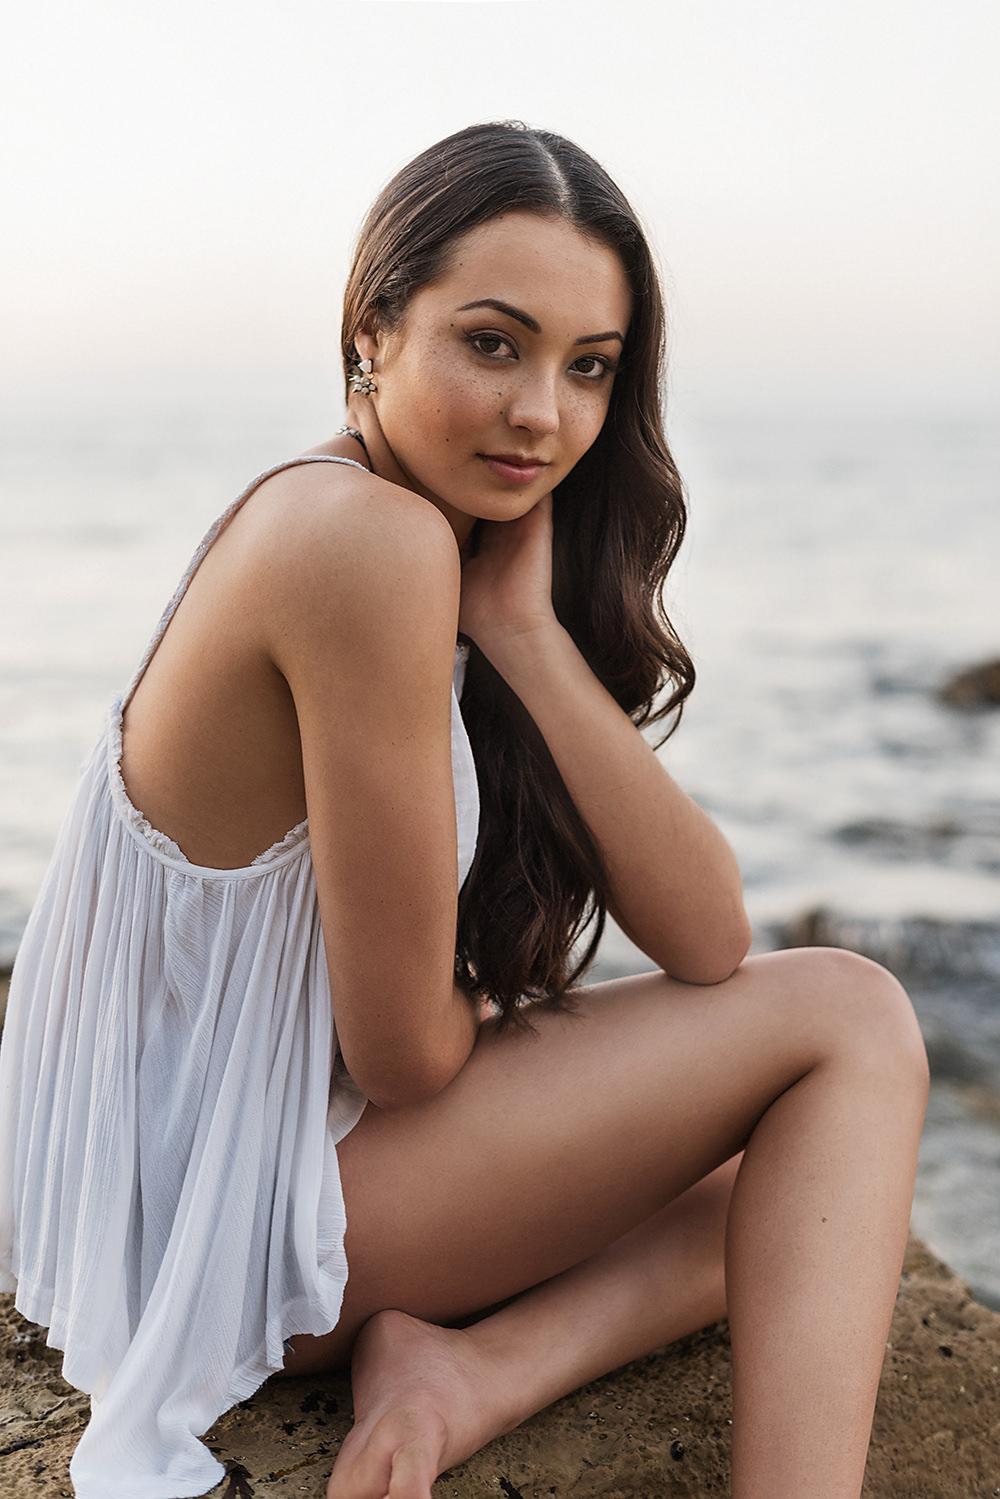 redondo-beach-photographer-marcus-roy-hoffman.jpg